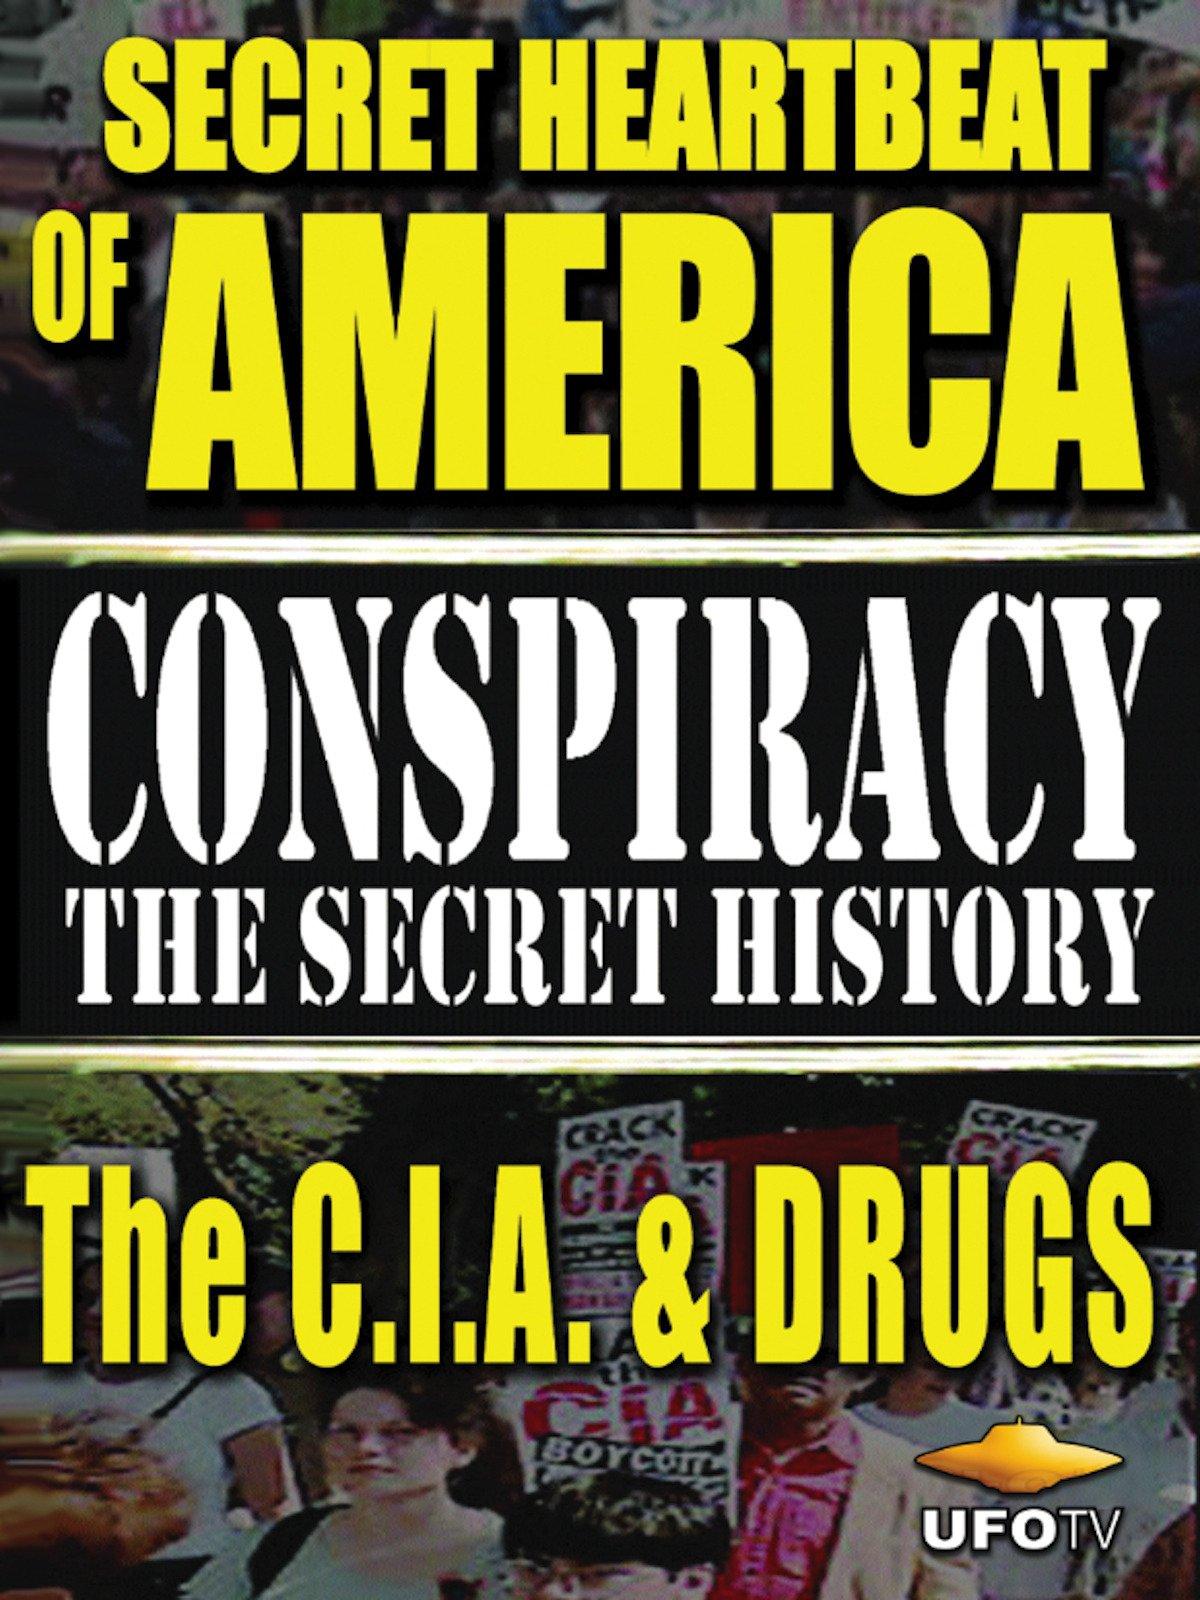 Conspiracy The Secret History